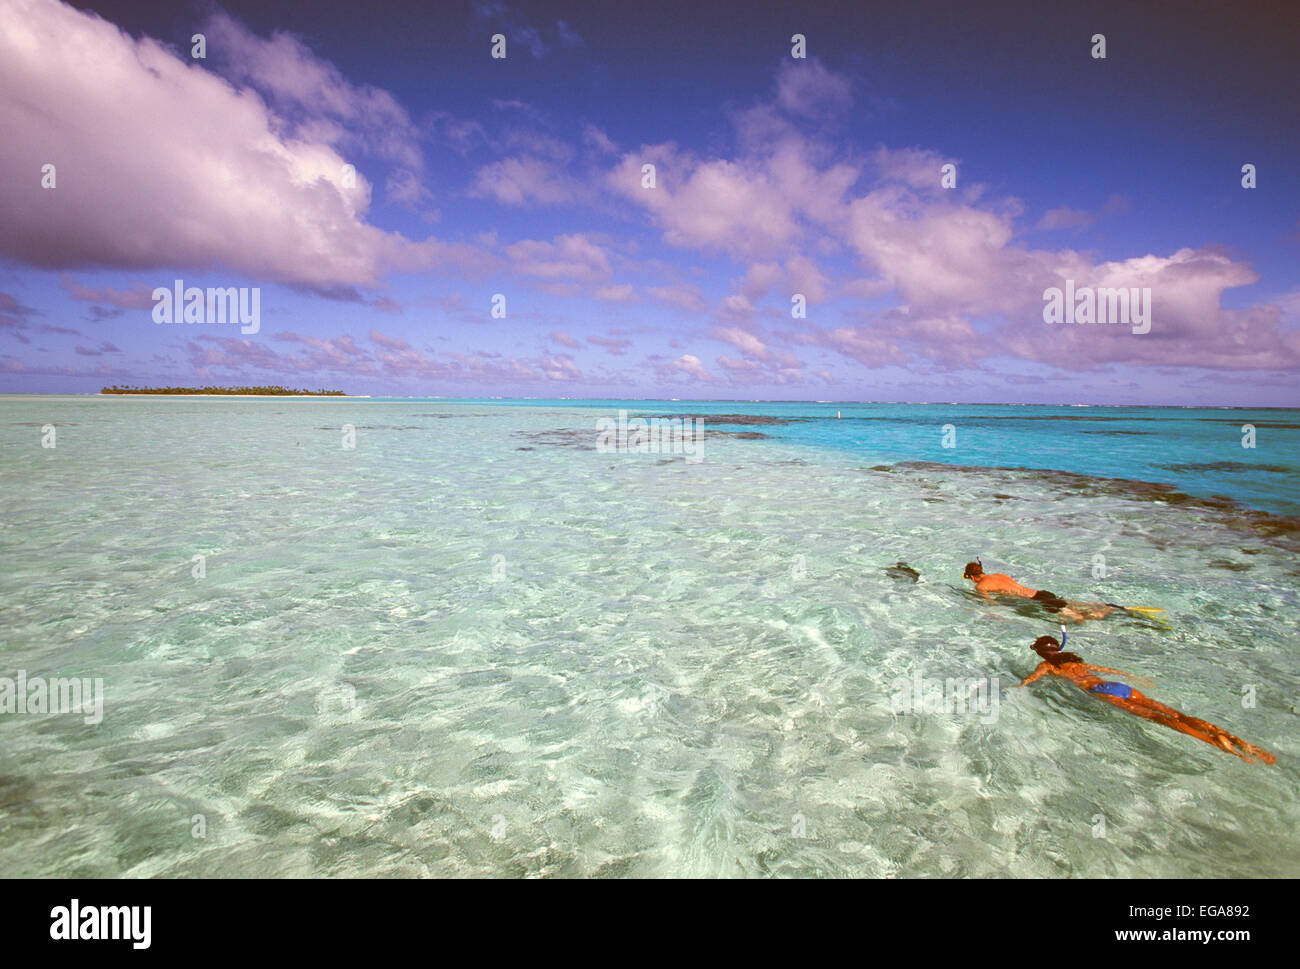 Aitutaki, Cook Islands - Stock Image